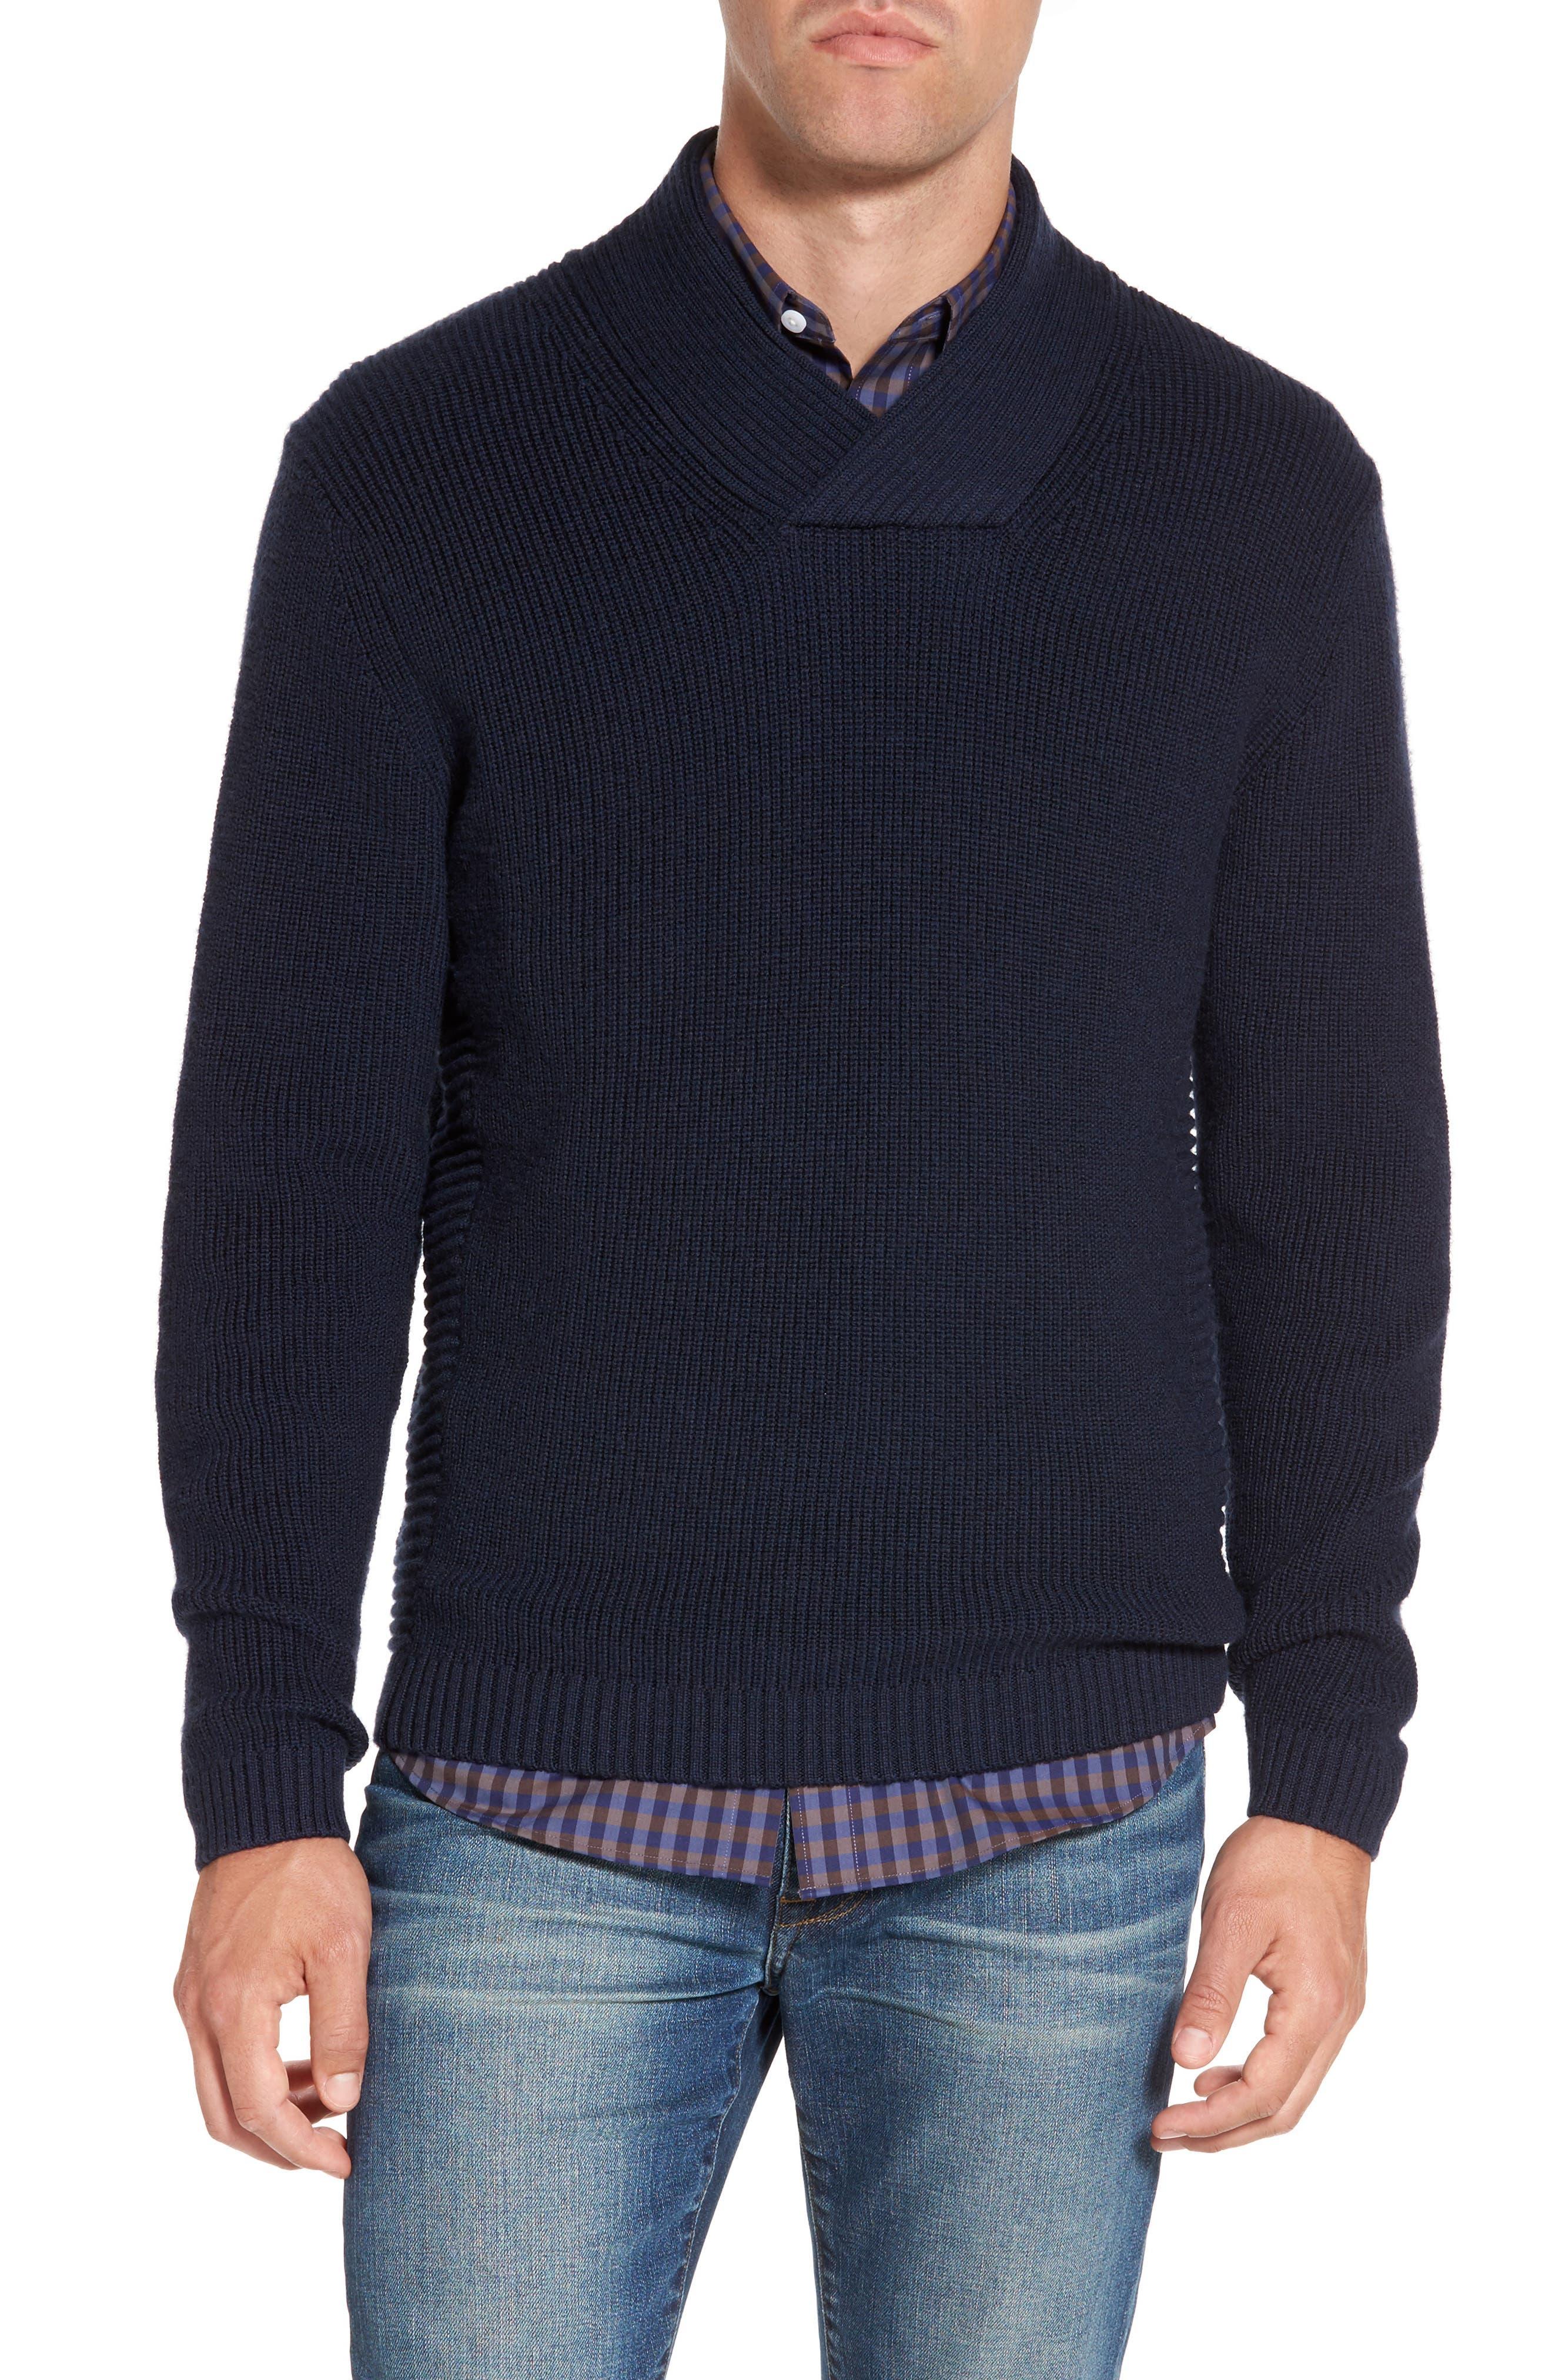 Charlesworth Suede Patch Merino Wool Sweater,                         Main,                         color, Marine